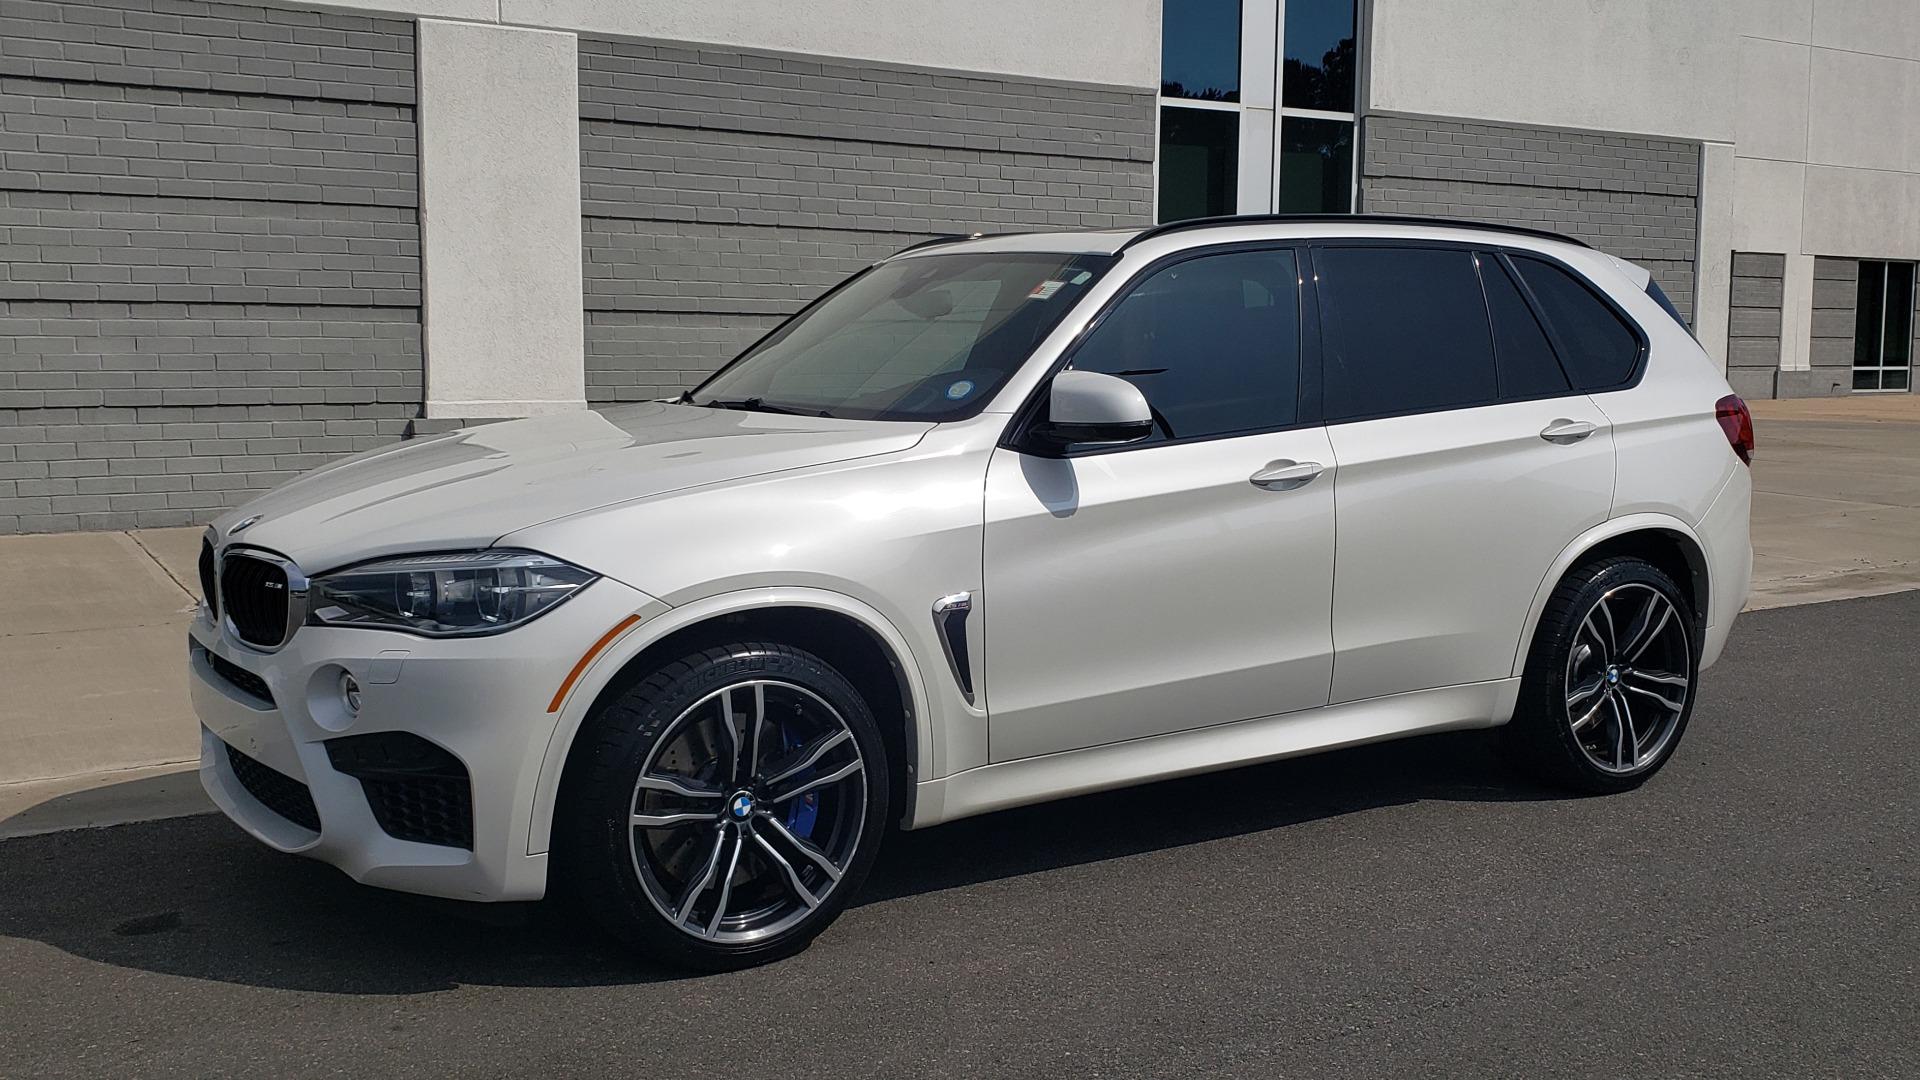 Used 2017 BMW X5 M EXECUTIVE PKG / NAV / DRVR ASST / BSM / HUD / HTD STS / WIFI for sale Sold at Formula Imports in Charlotte NC 28227 6